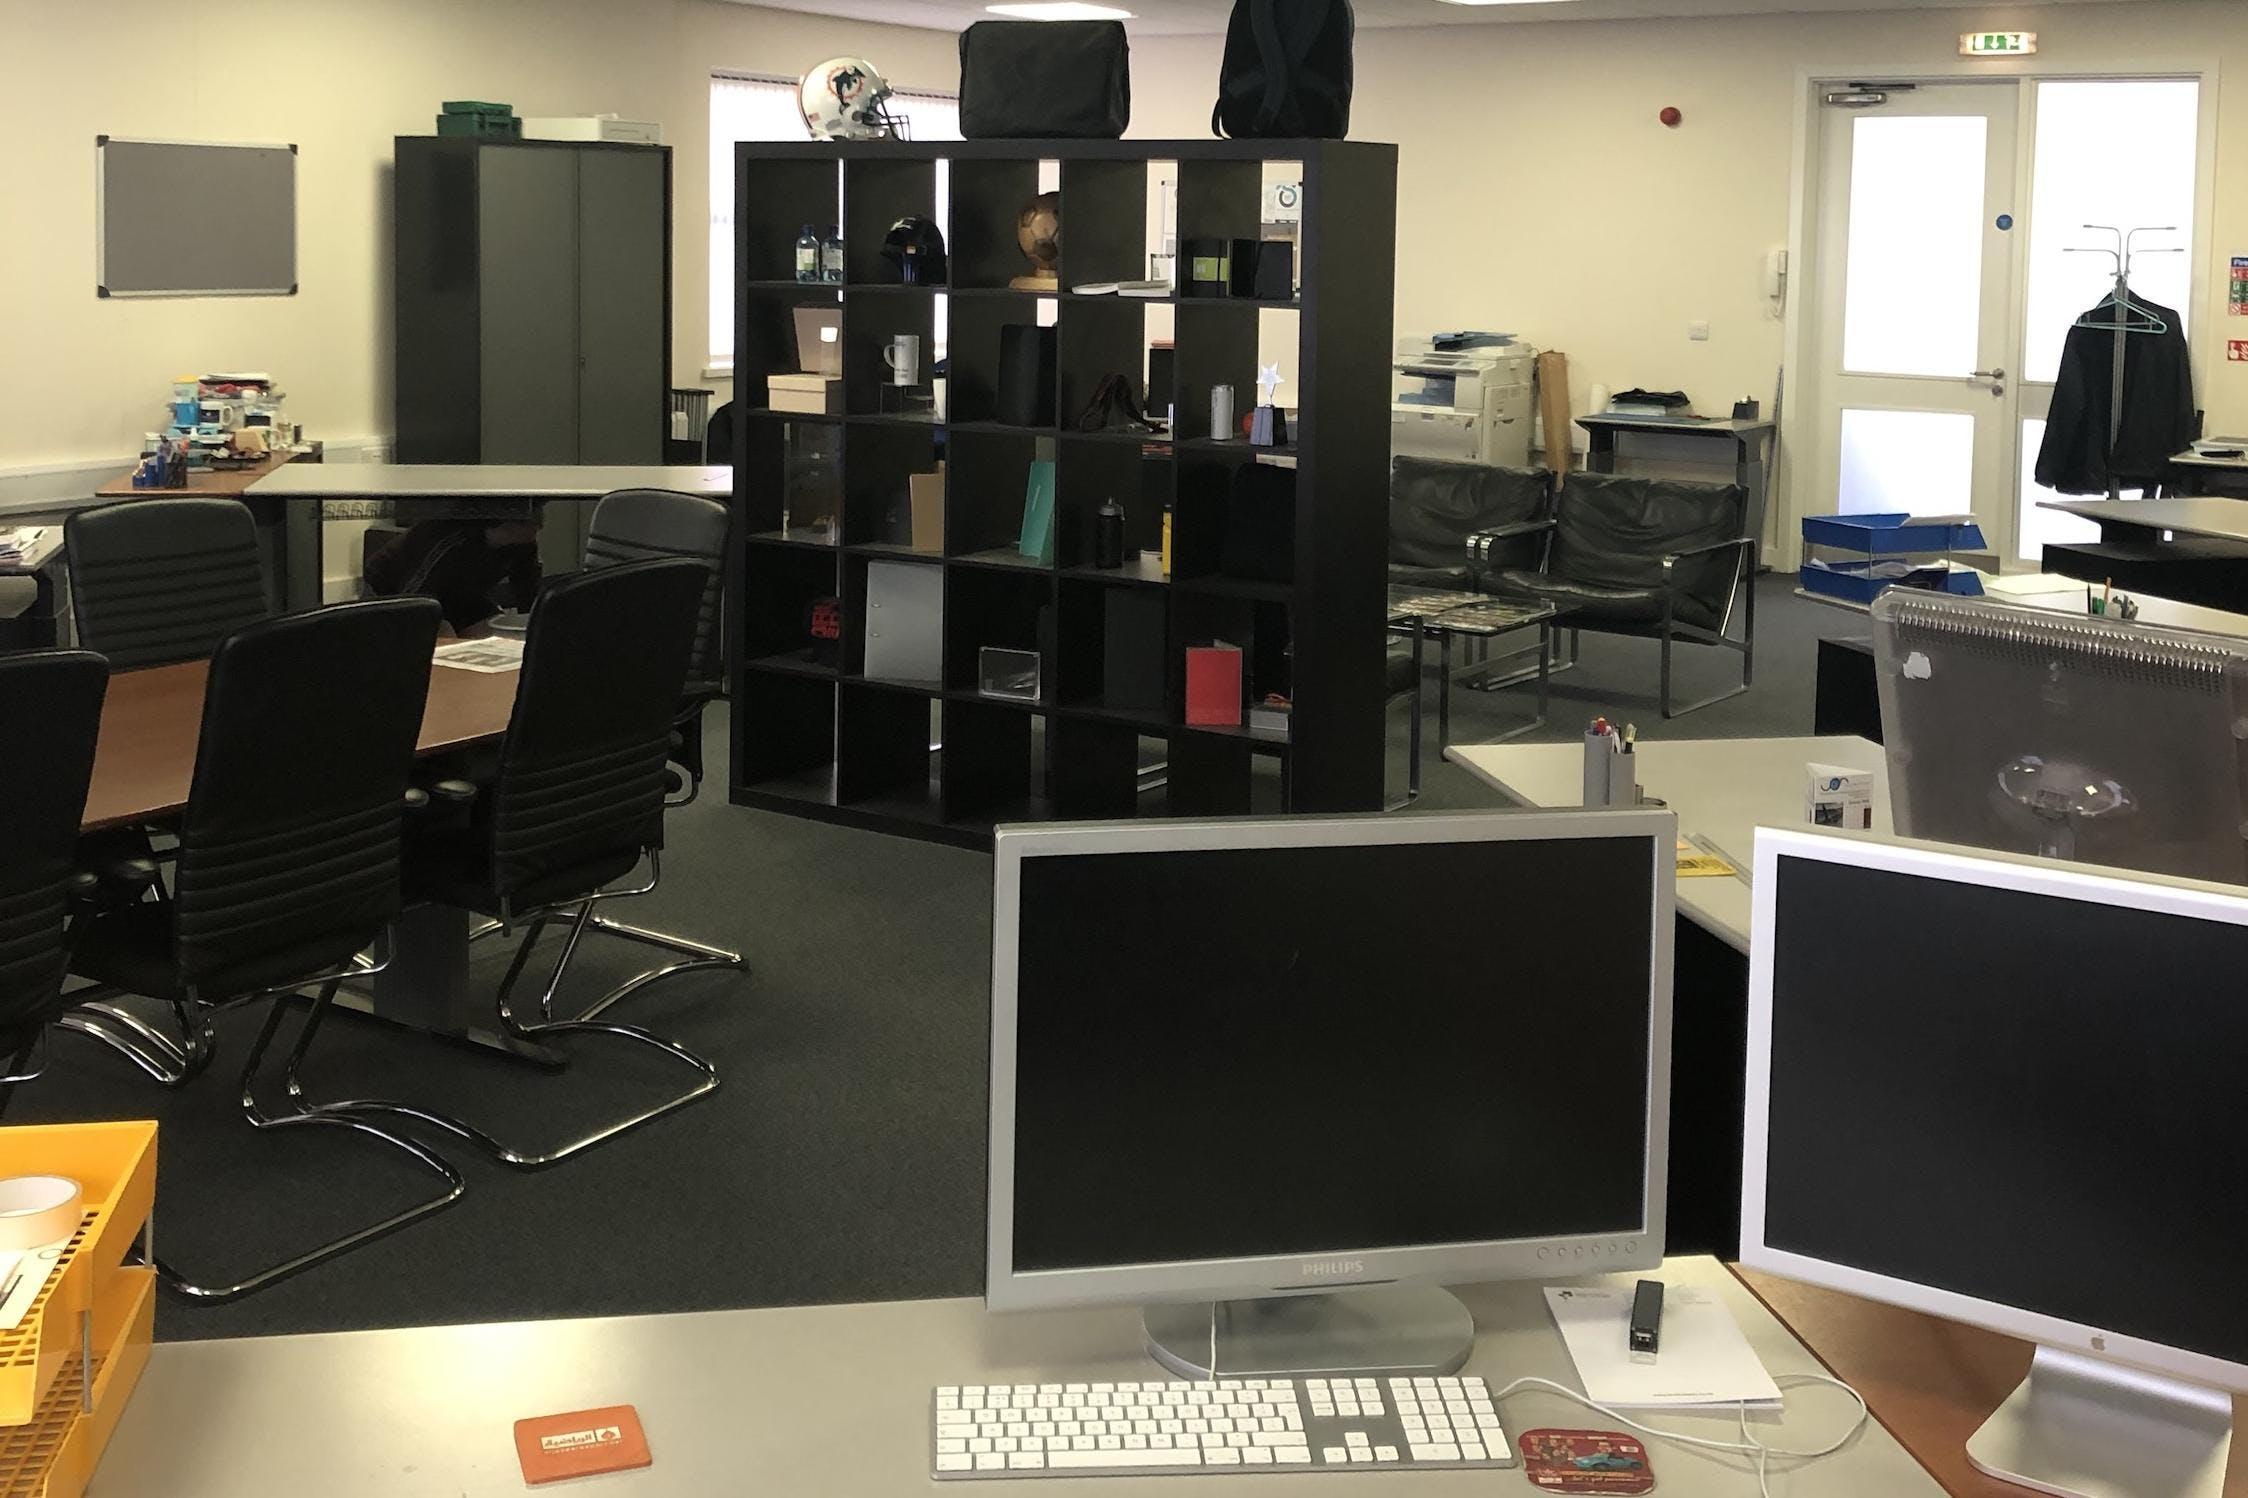 6 Shepcote Office Village, Unit 6, Shepcote Office Village, Sheffield, Offices To Let / For Sale - Ground FloorOffice - Shepcote.jpeg